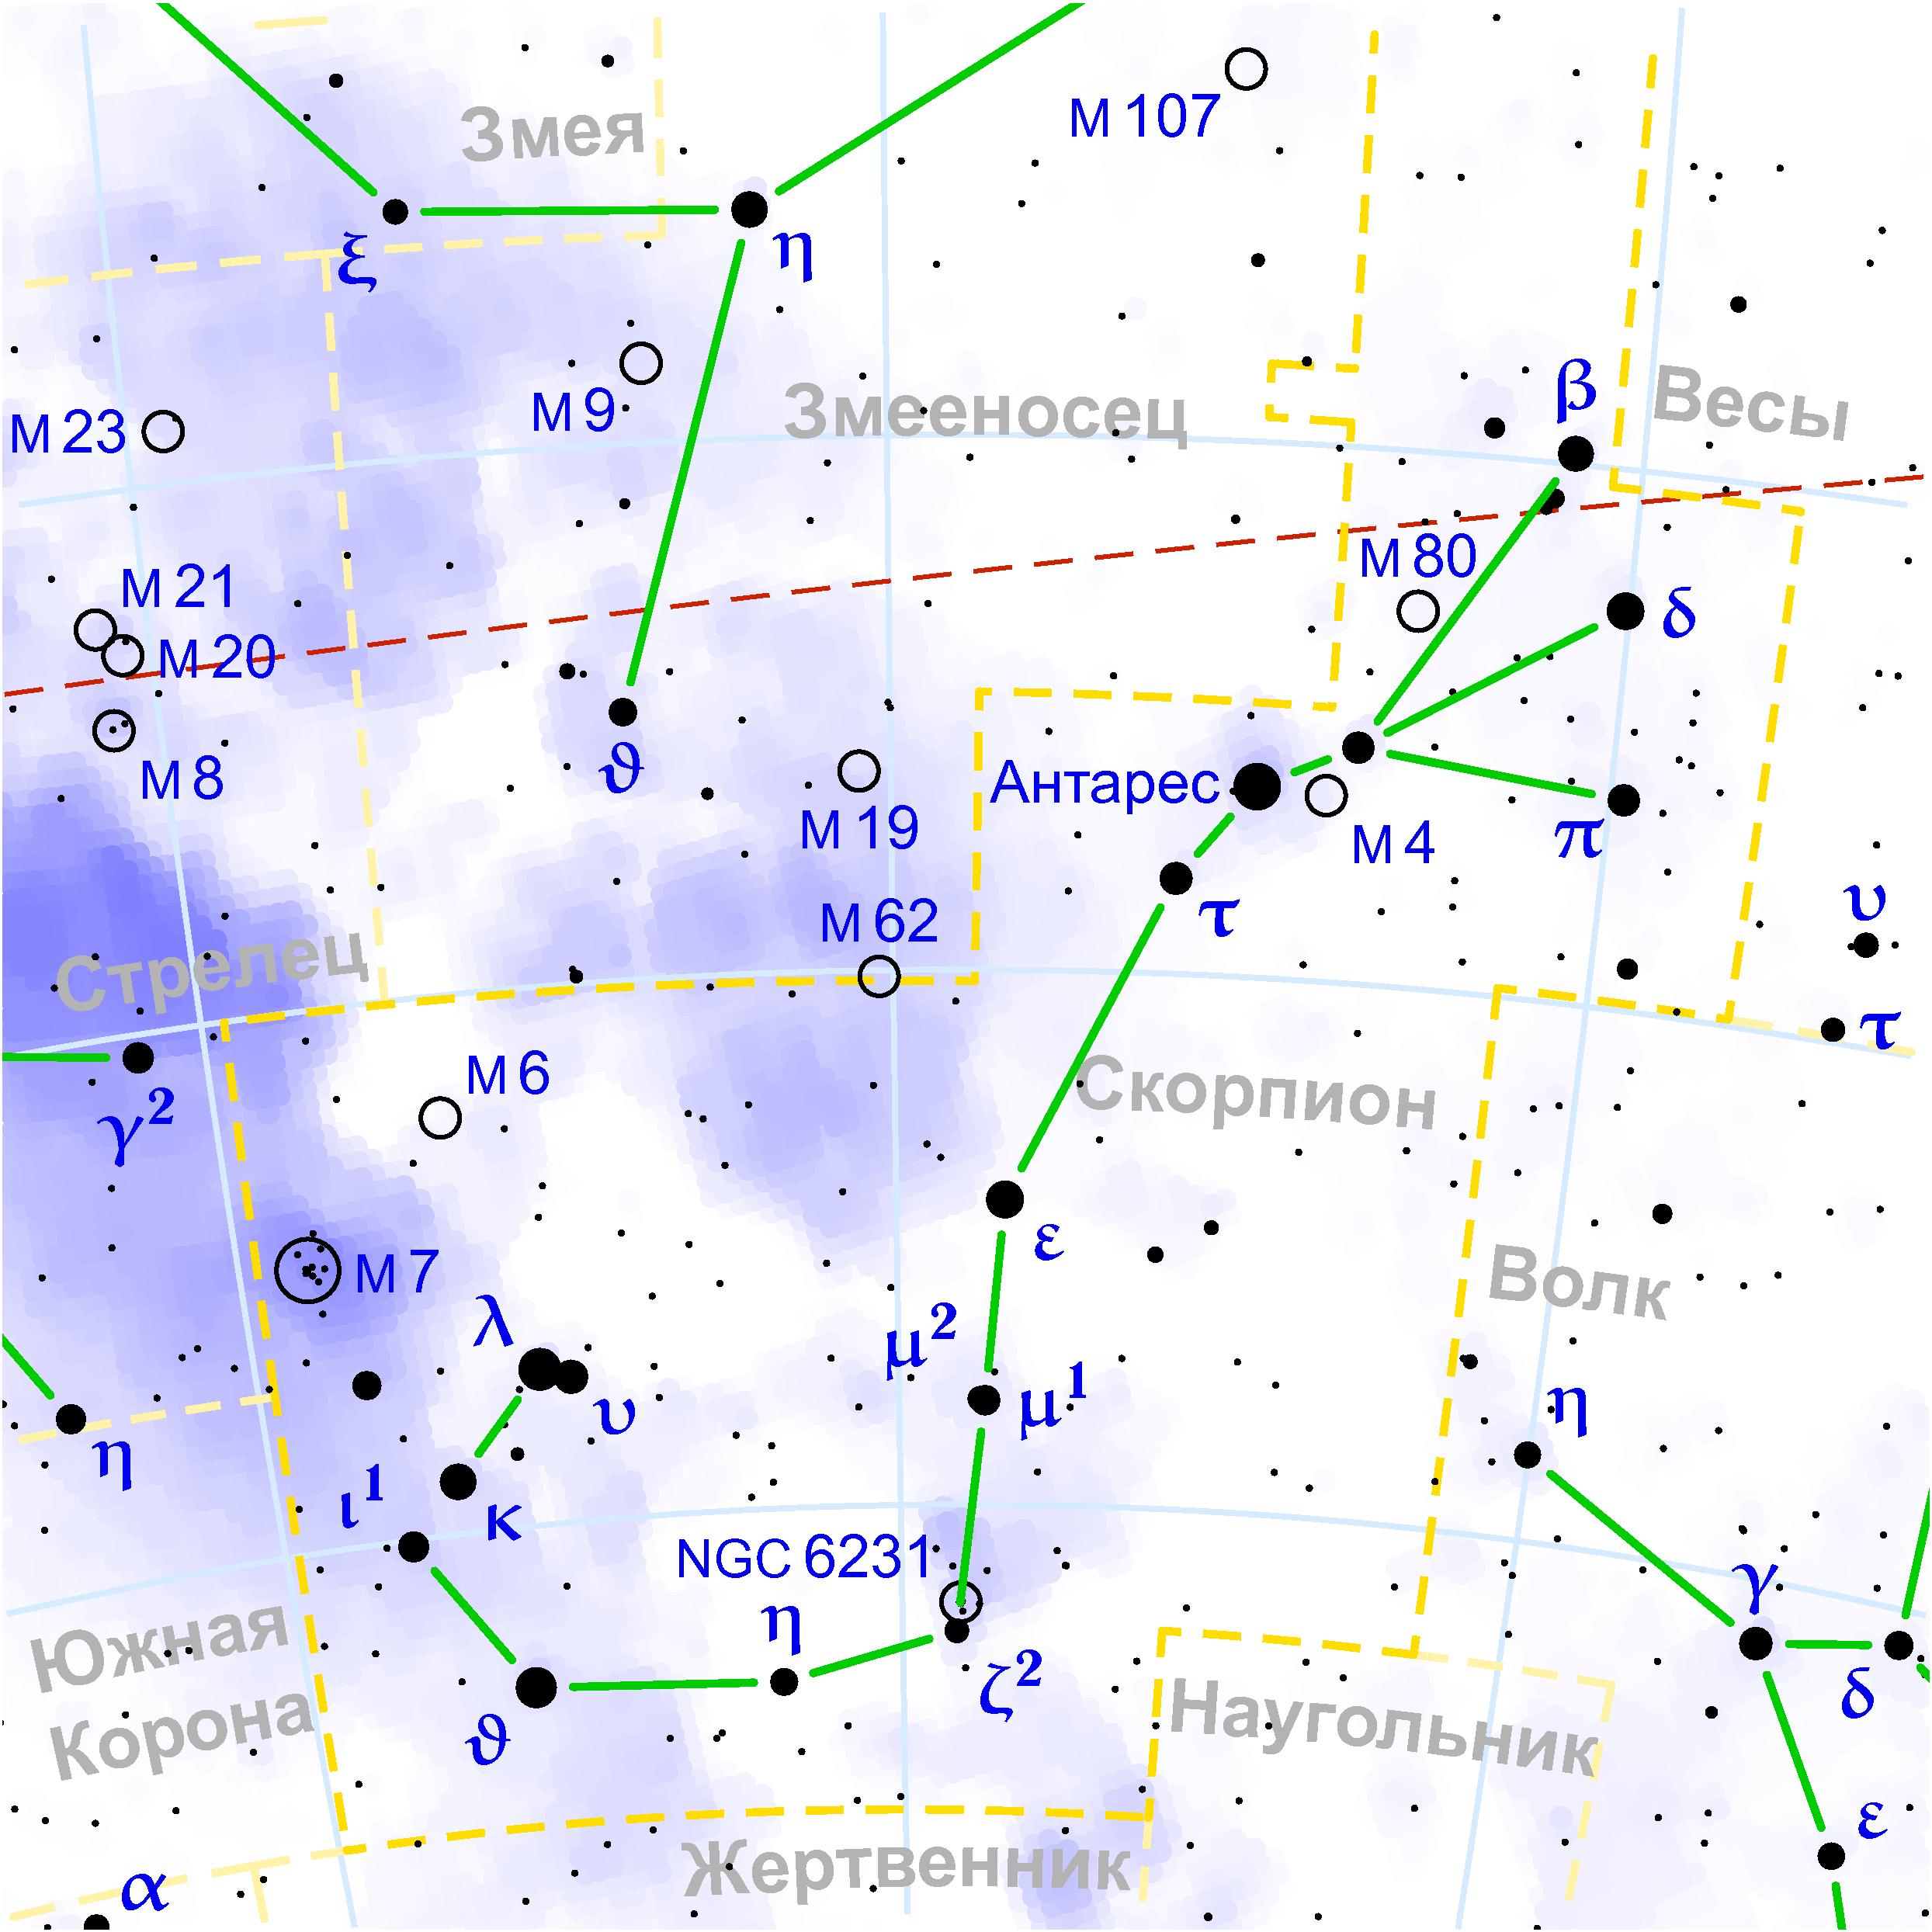 Созвездие скорпион википедия доклад 5092